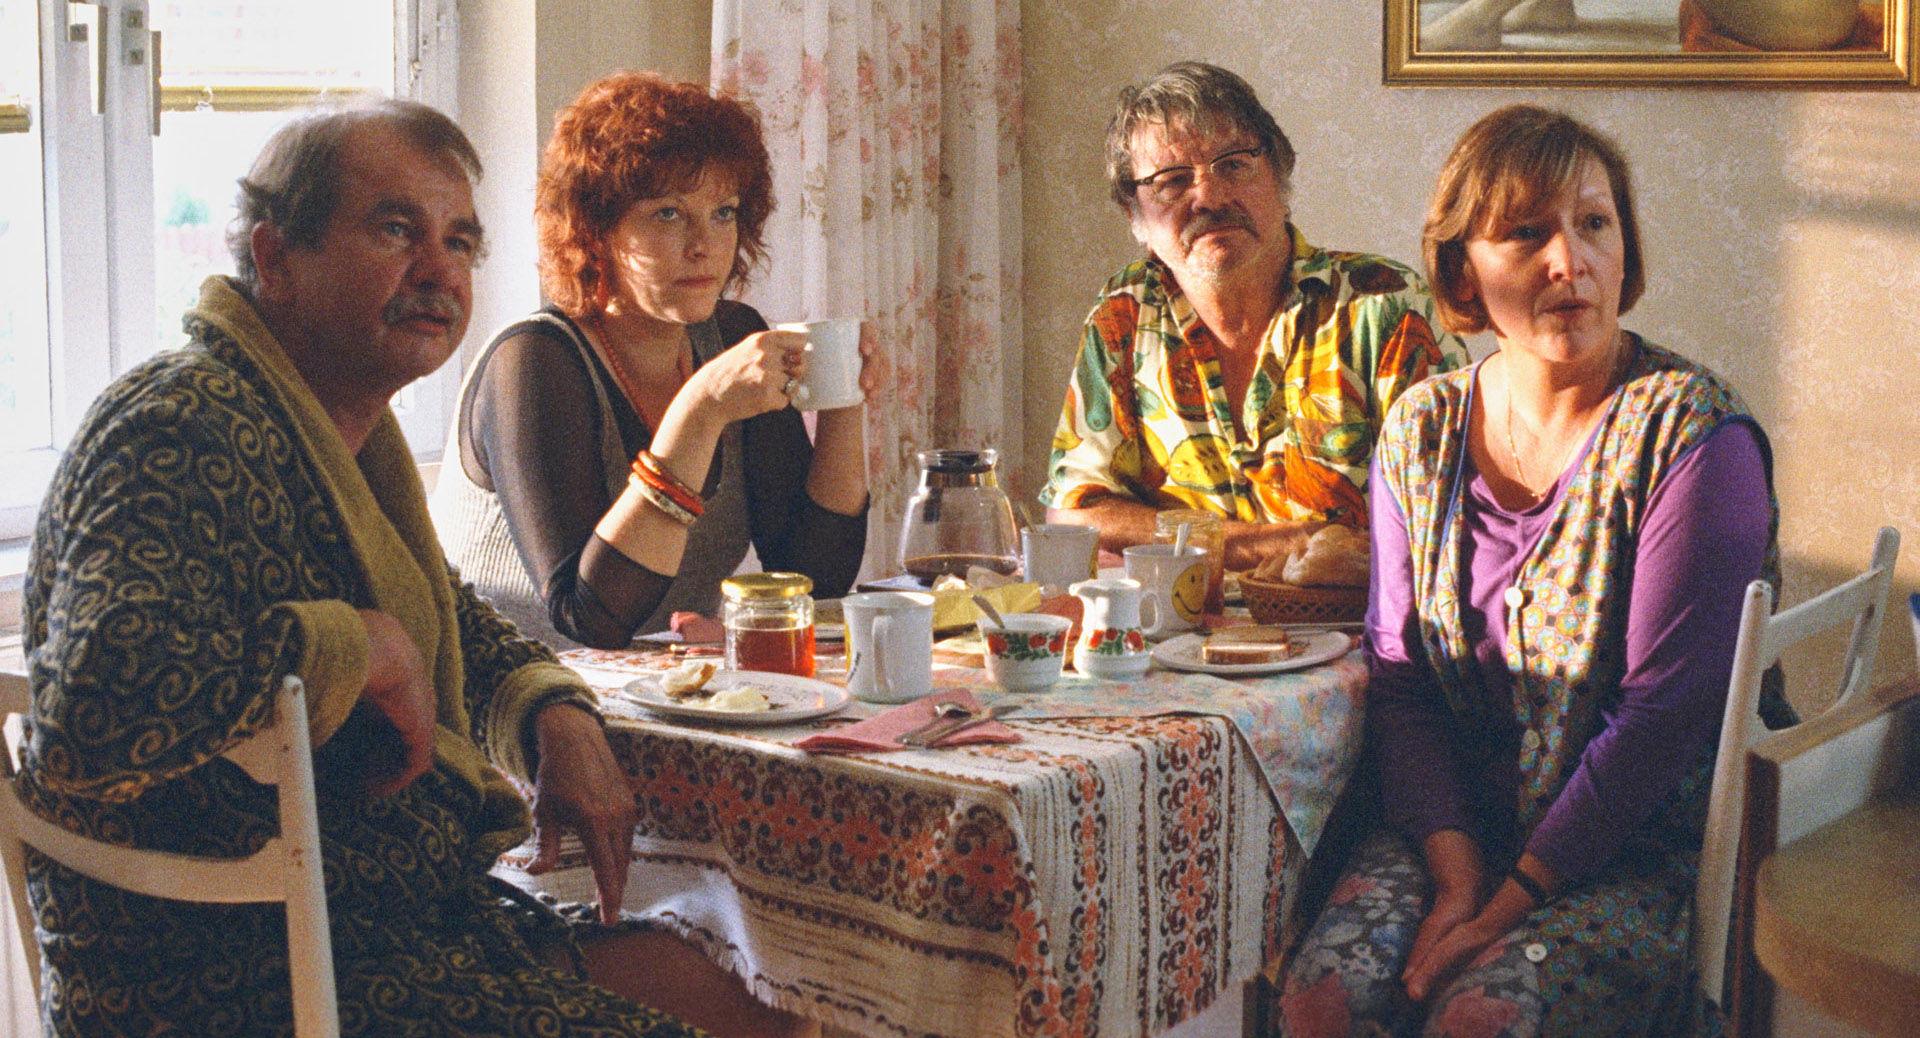 Ernst Konarek (Sigis Vater), Elfi Eschke (Henny), Heinz Petters (Sigis Opa), Kitty Speiser (Sigis Mutter)